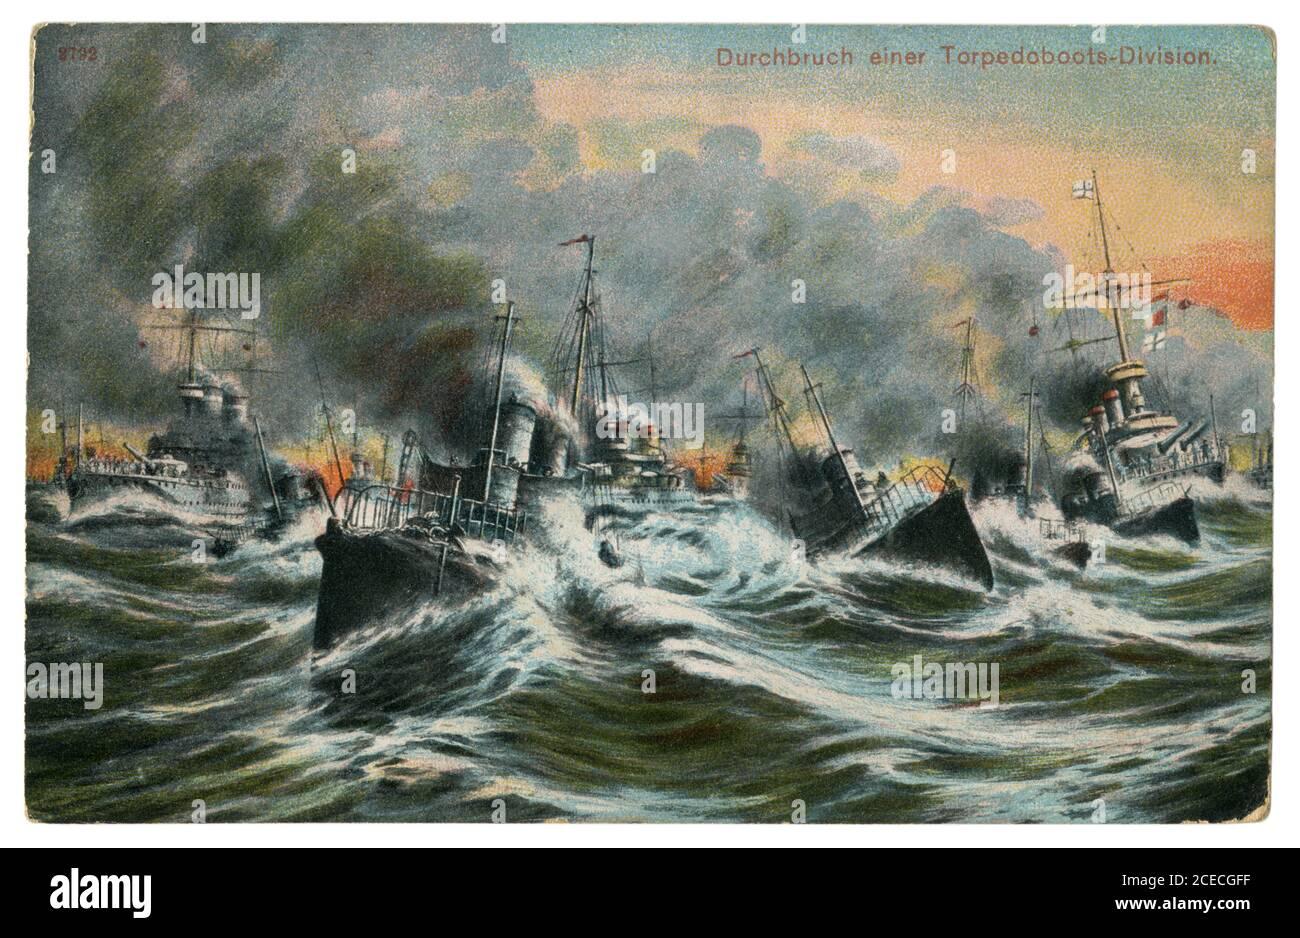 German historical postcard: Breakthrough of a torpedo boat division. A flotilla in a rough sea. Imperial German Navy (kaisermarine), 1908 Stock Photo